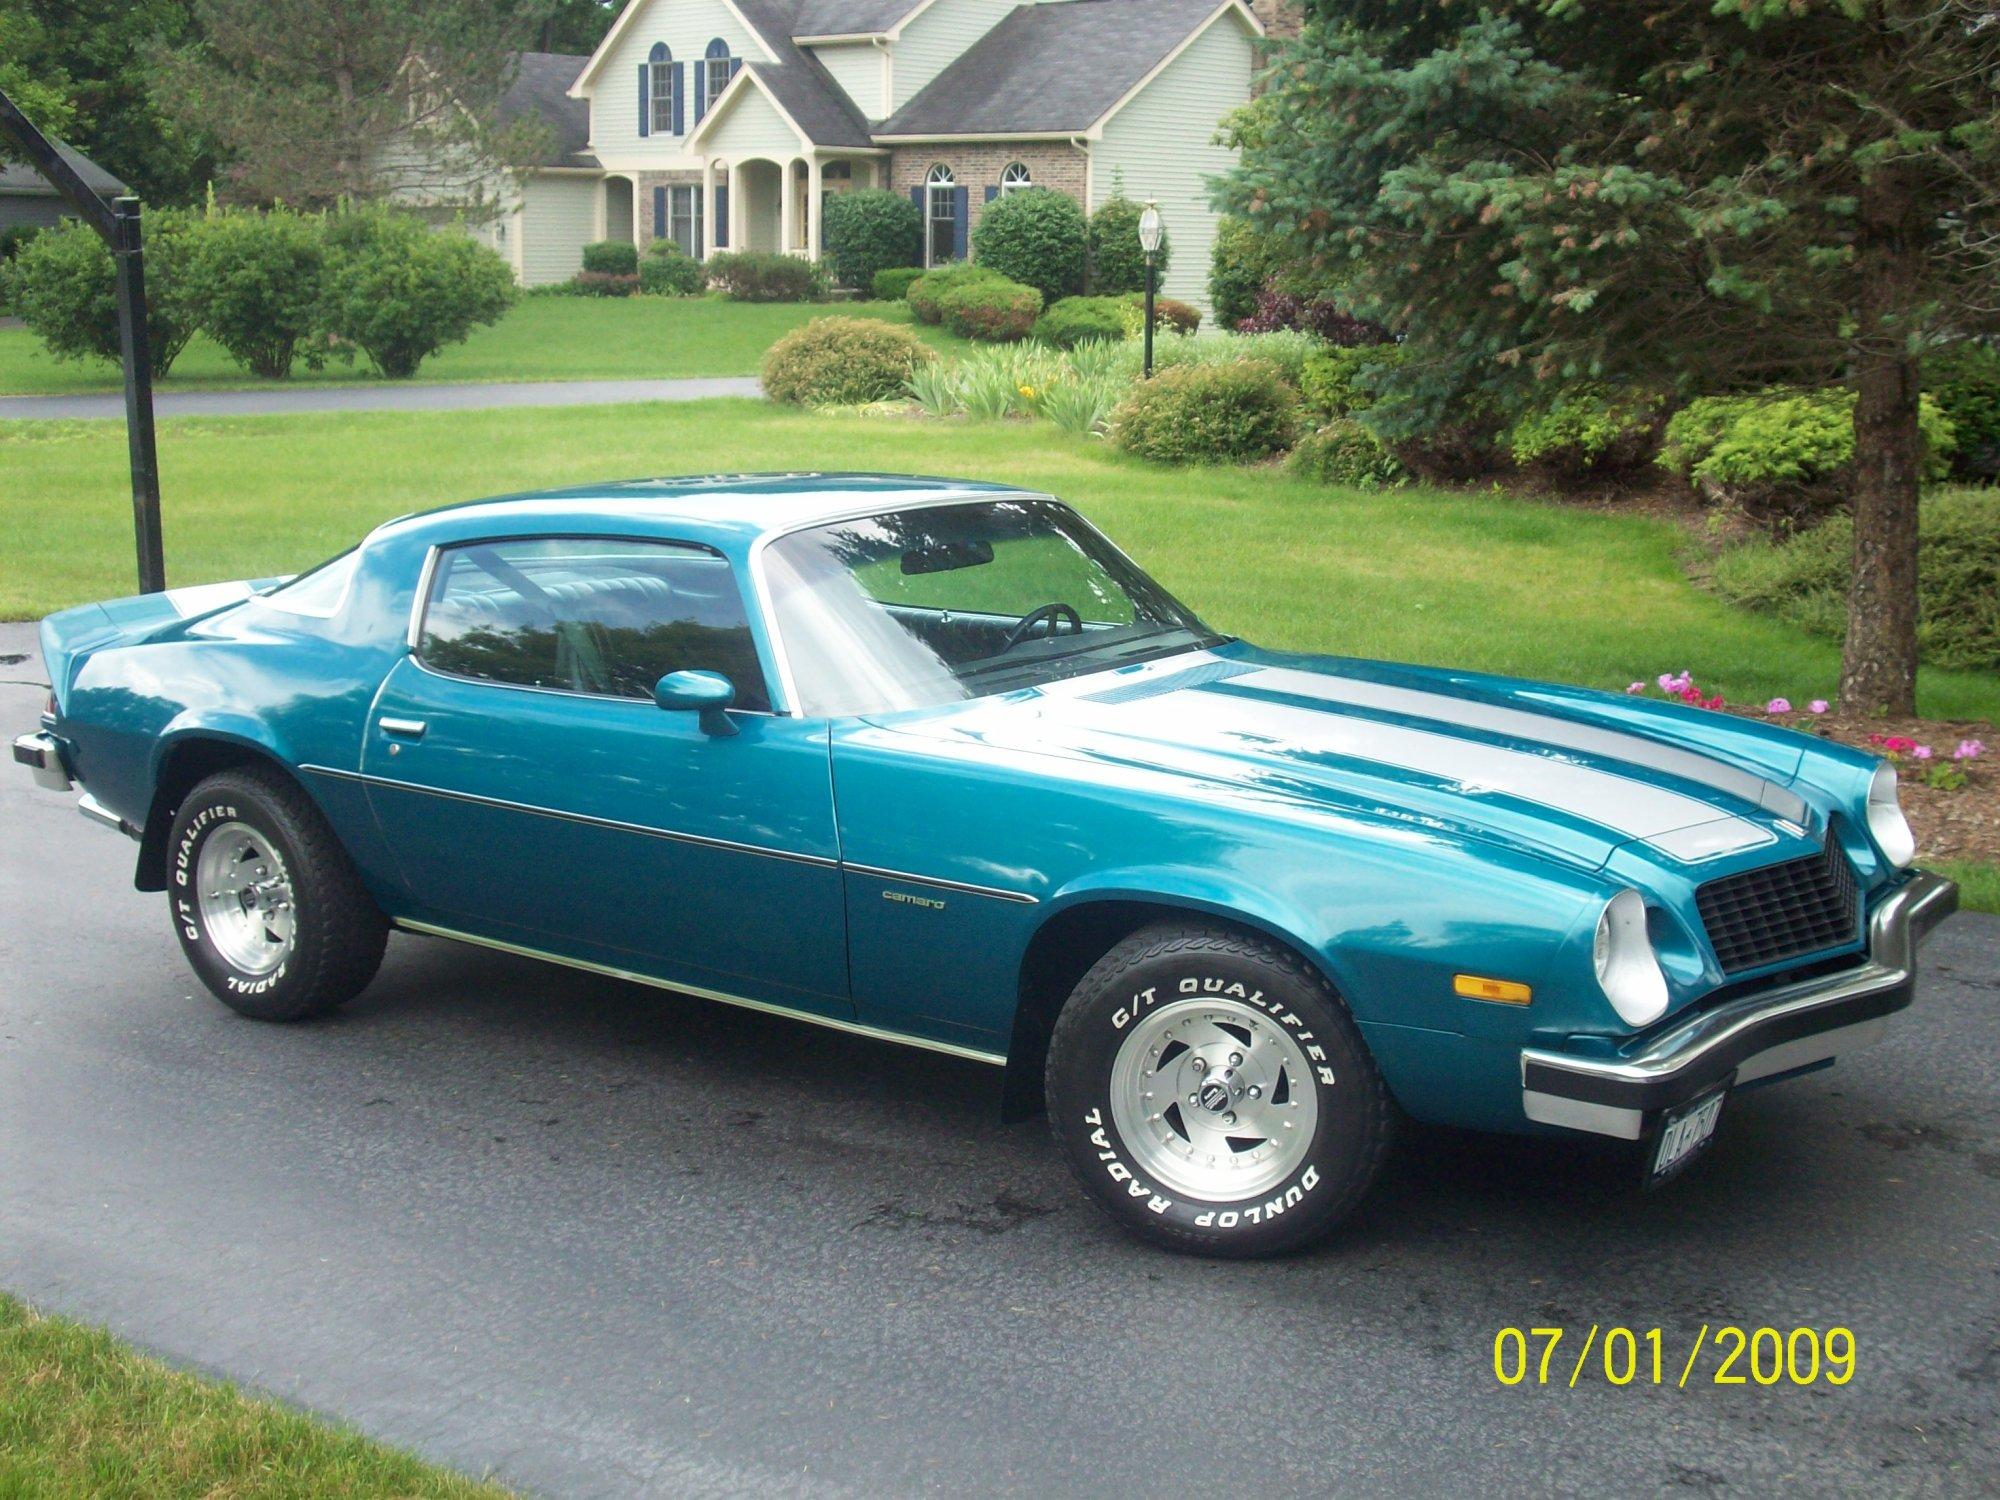 hight resolution of chevrolet camaro 1977 5 chevrolet camaro 1977 5